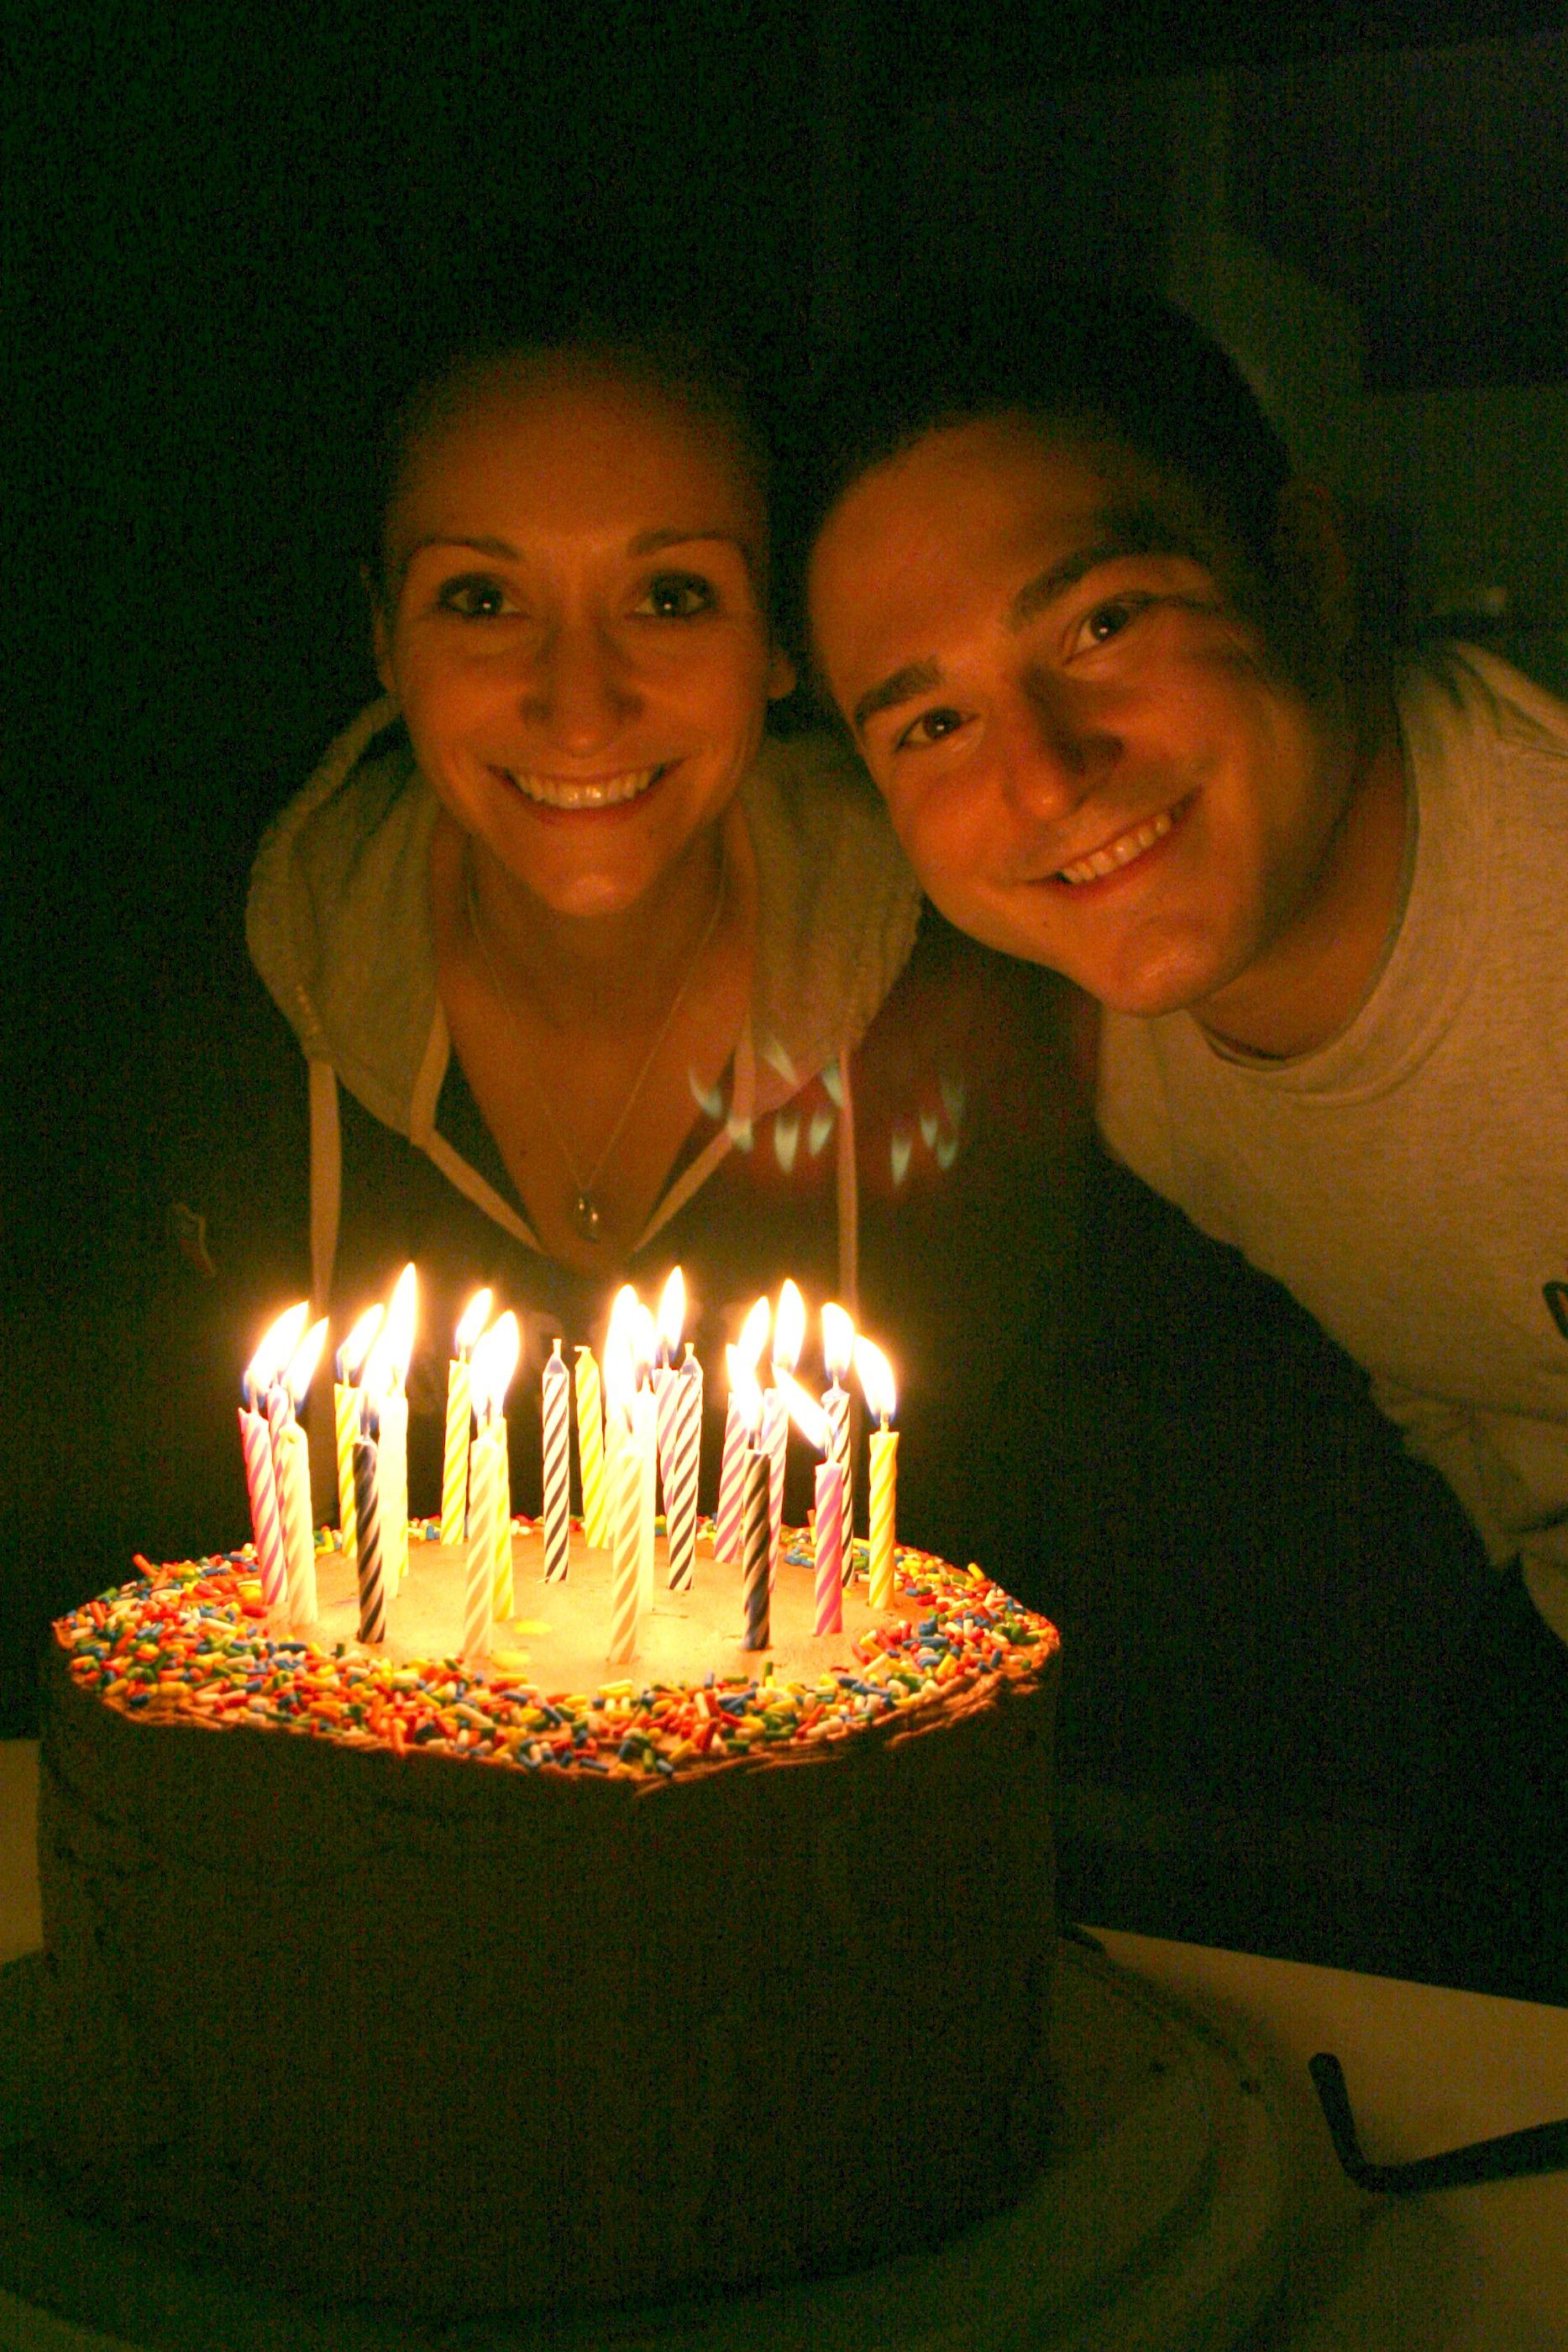 Wondrous Re Post Of The Best Birthday Cake So Far Mom Makes Funny Birthday Cards Online Unhofree Goldxyz